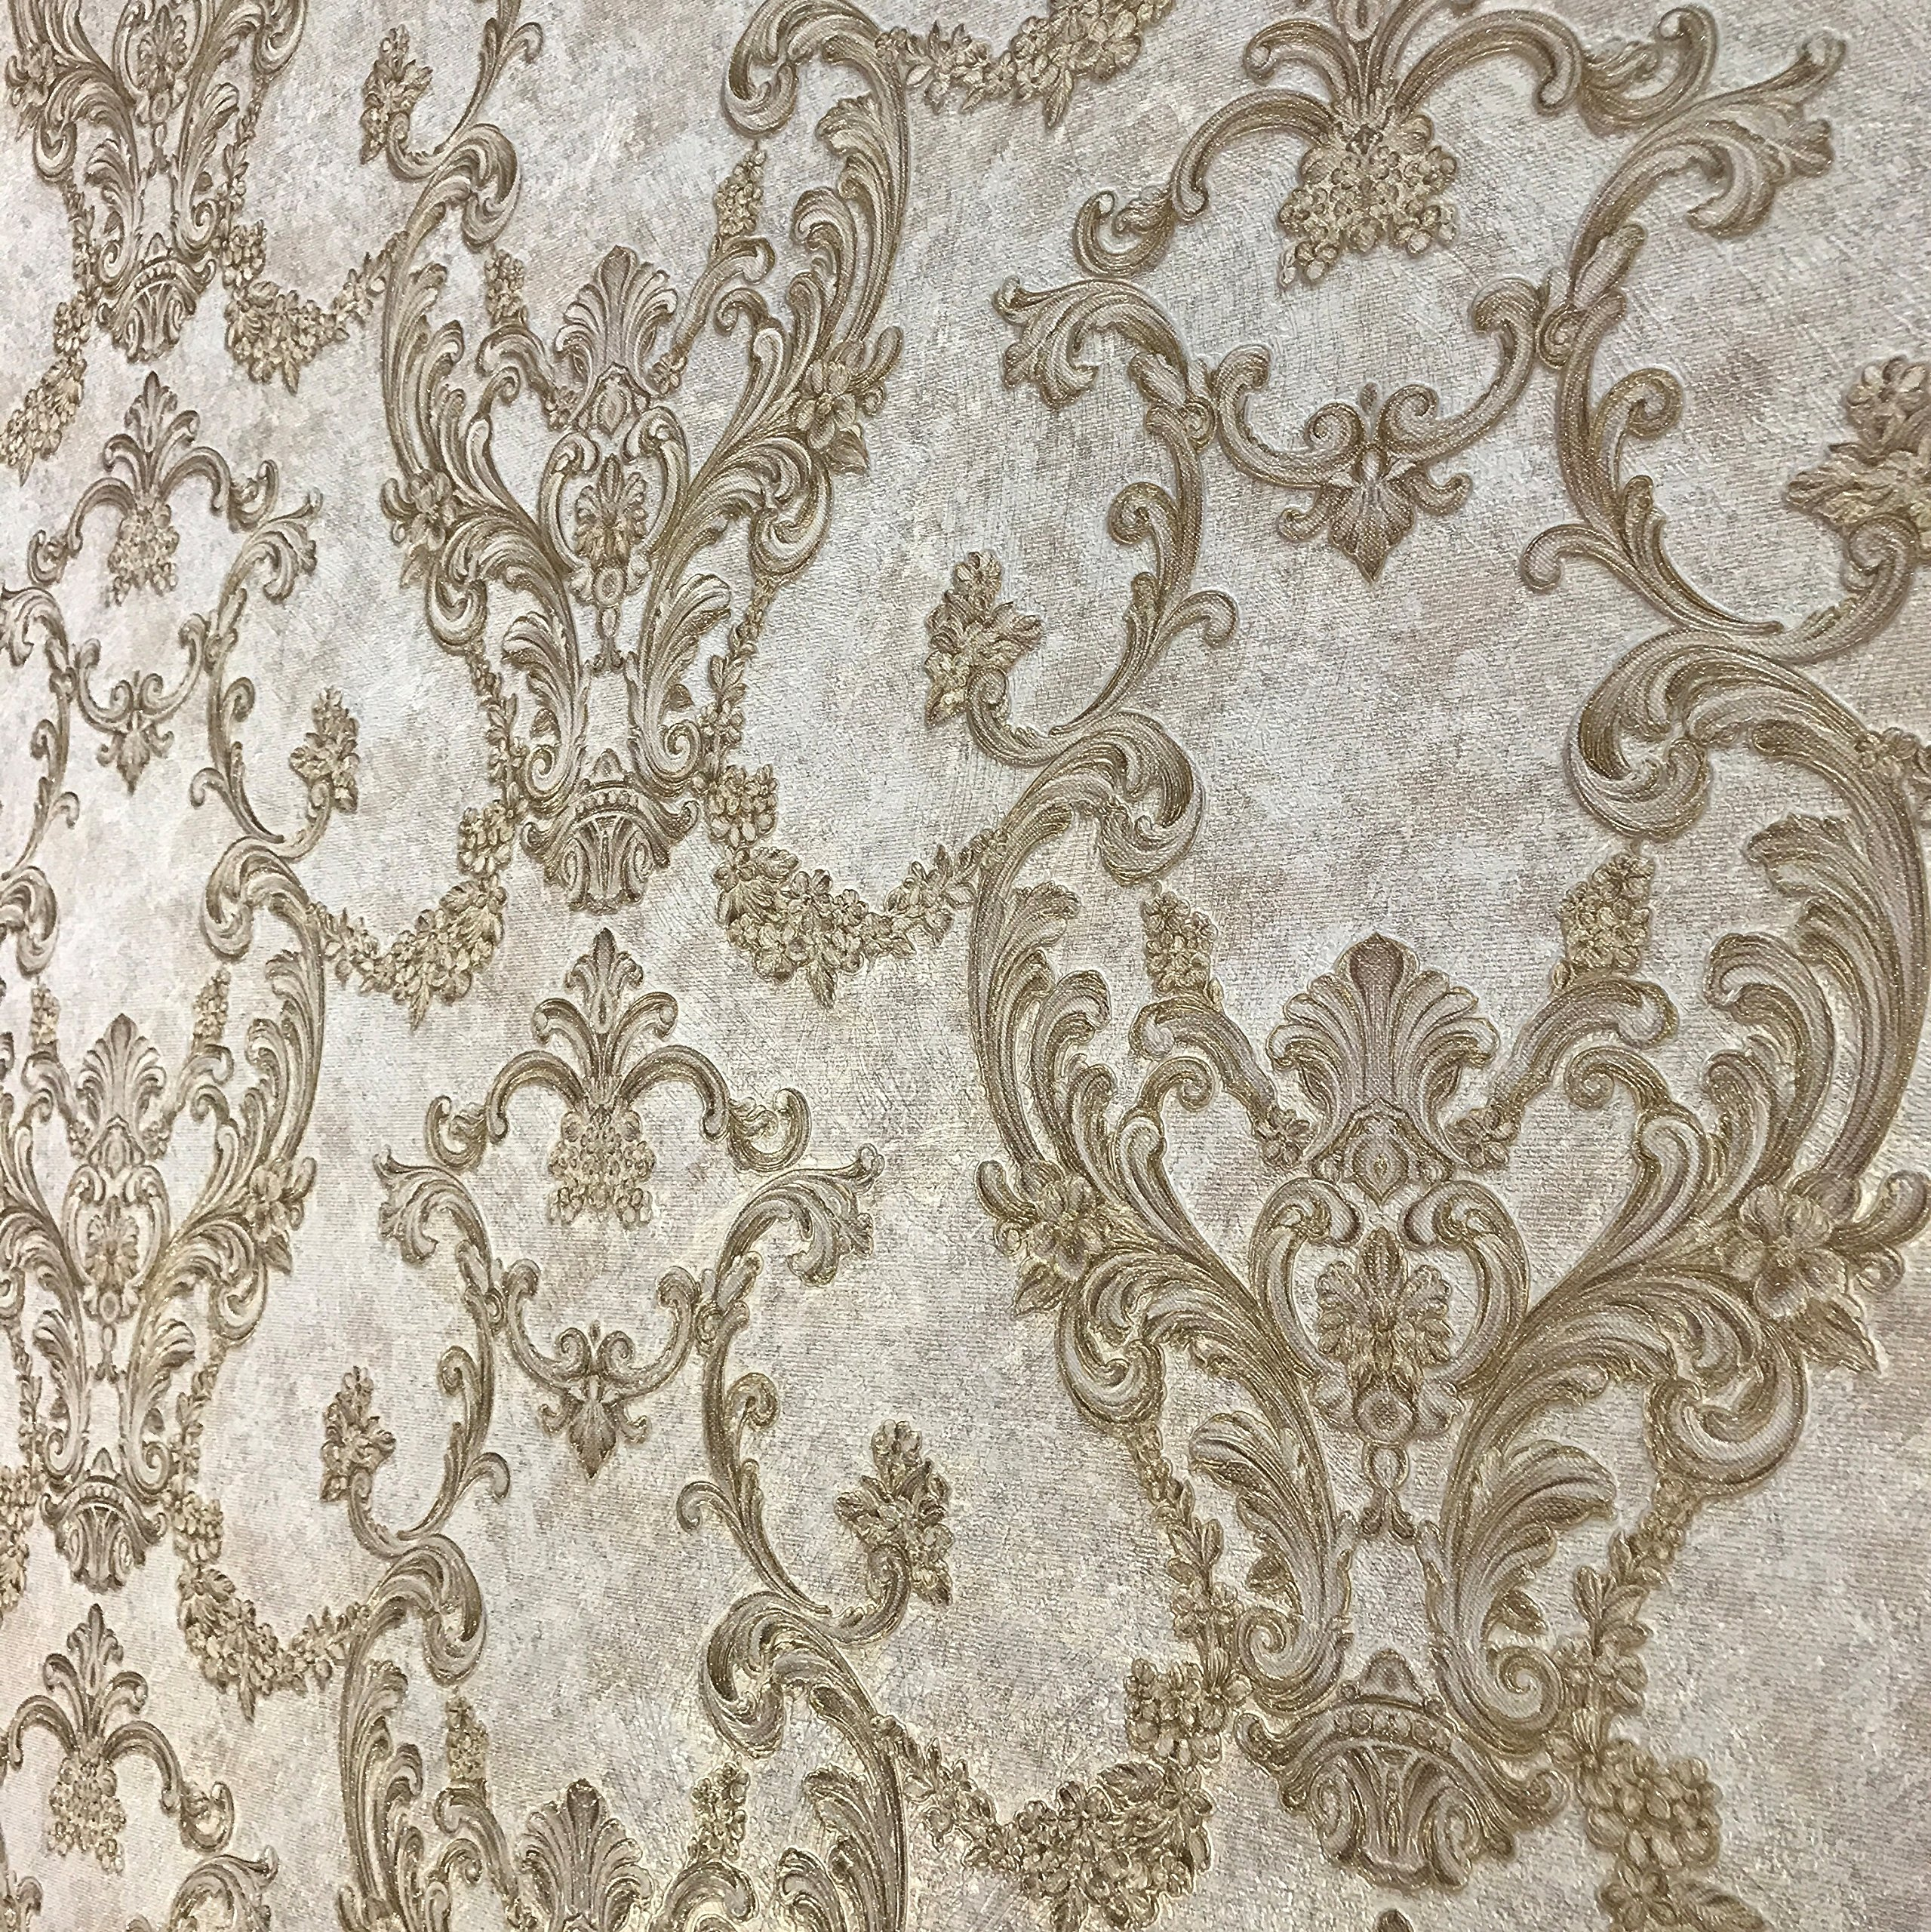 Embossed Vinyl Non-Woven Slavyanski wallcovering victorian damask 3D vintage retro pattern Wallpaper rolls ivory brown gold bronze metallic textured rust rustic plaster effect glitters paste the wall